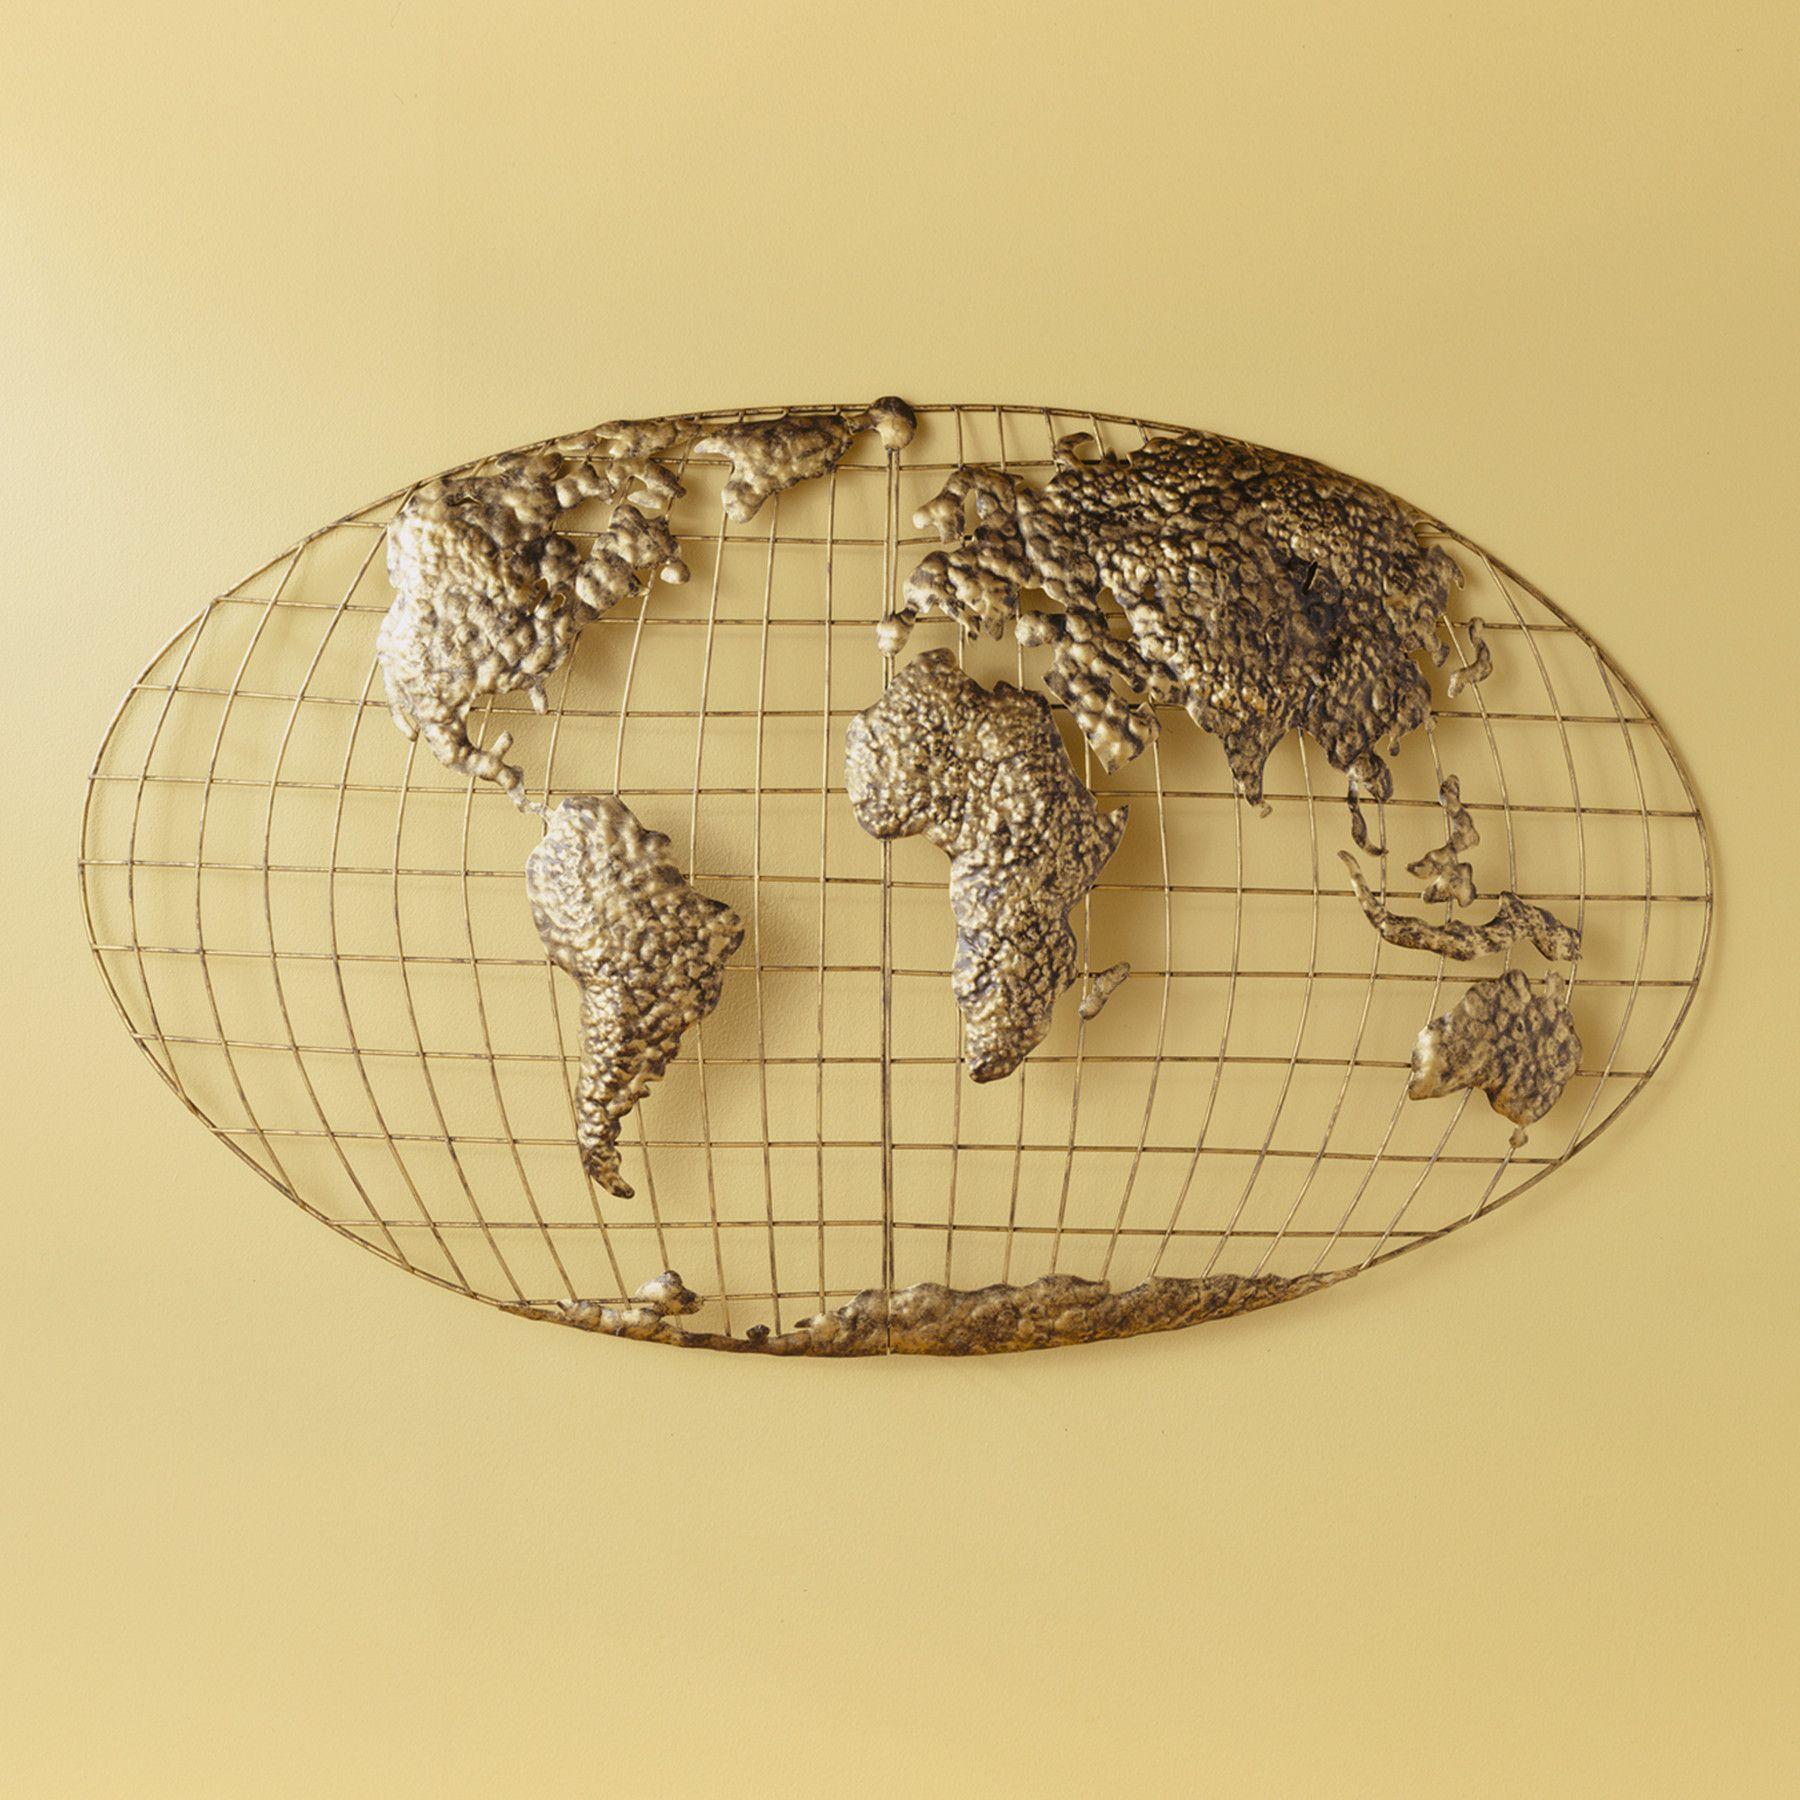 Iron World Map Wall Art | Places | Pinterest | Iron and Walls